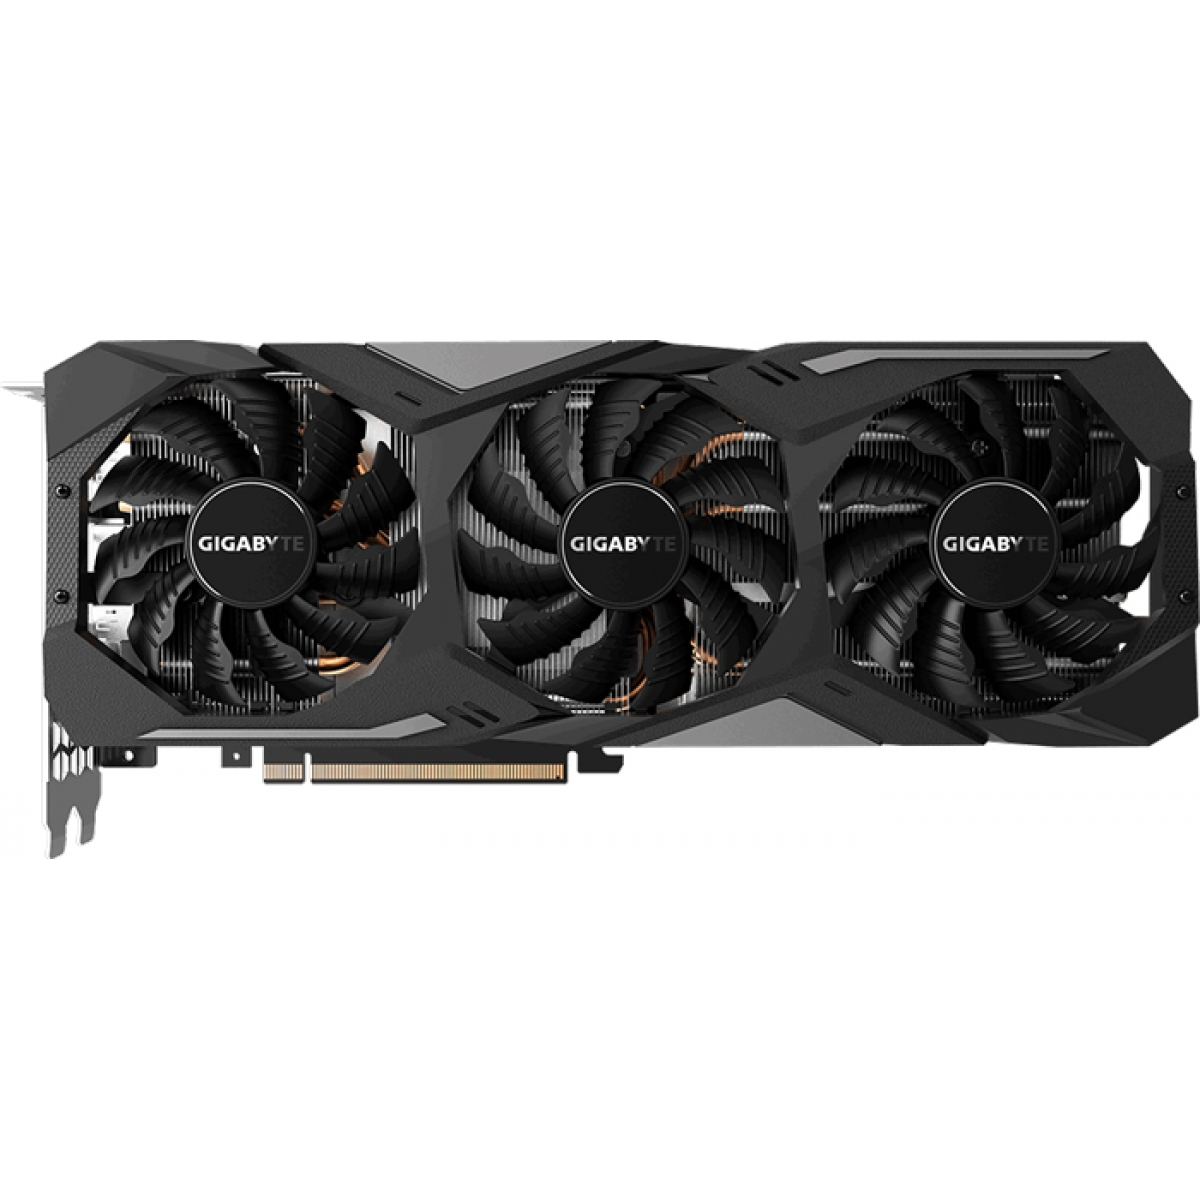 Placa De Vídeo Gigabyte Geforce RTX 2080 Gaming OC 8GB GV-N2080GAMING OC-8GC GDDR6 PCI-EXP